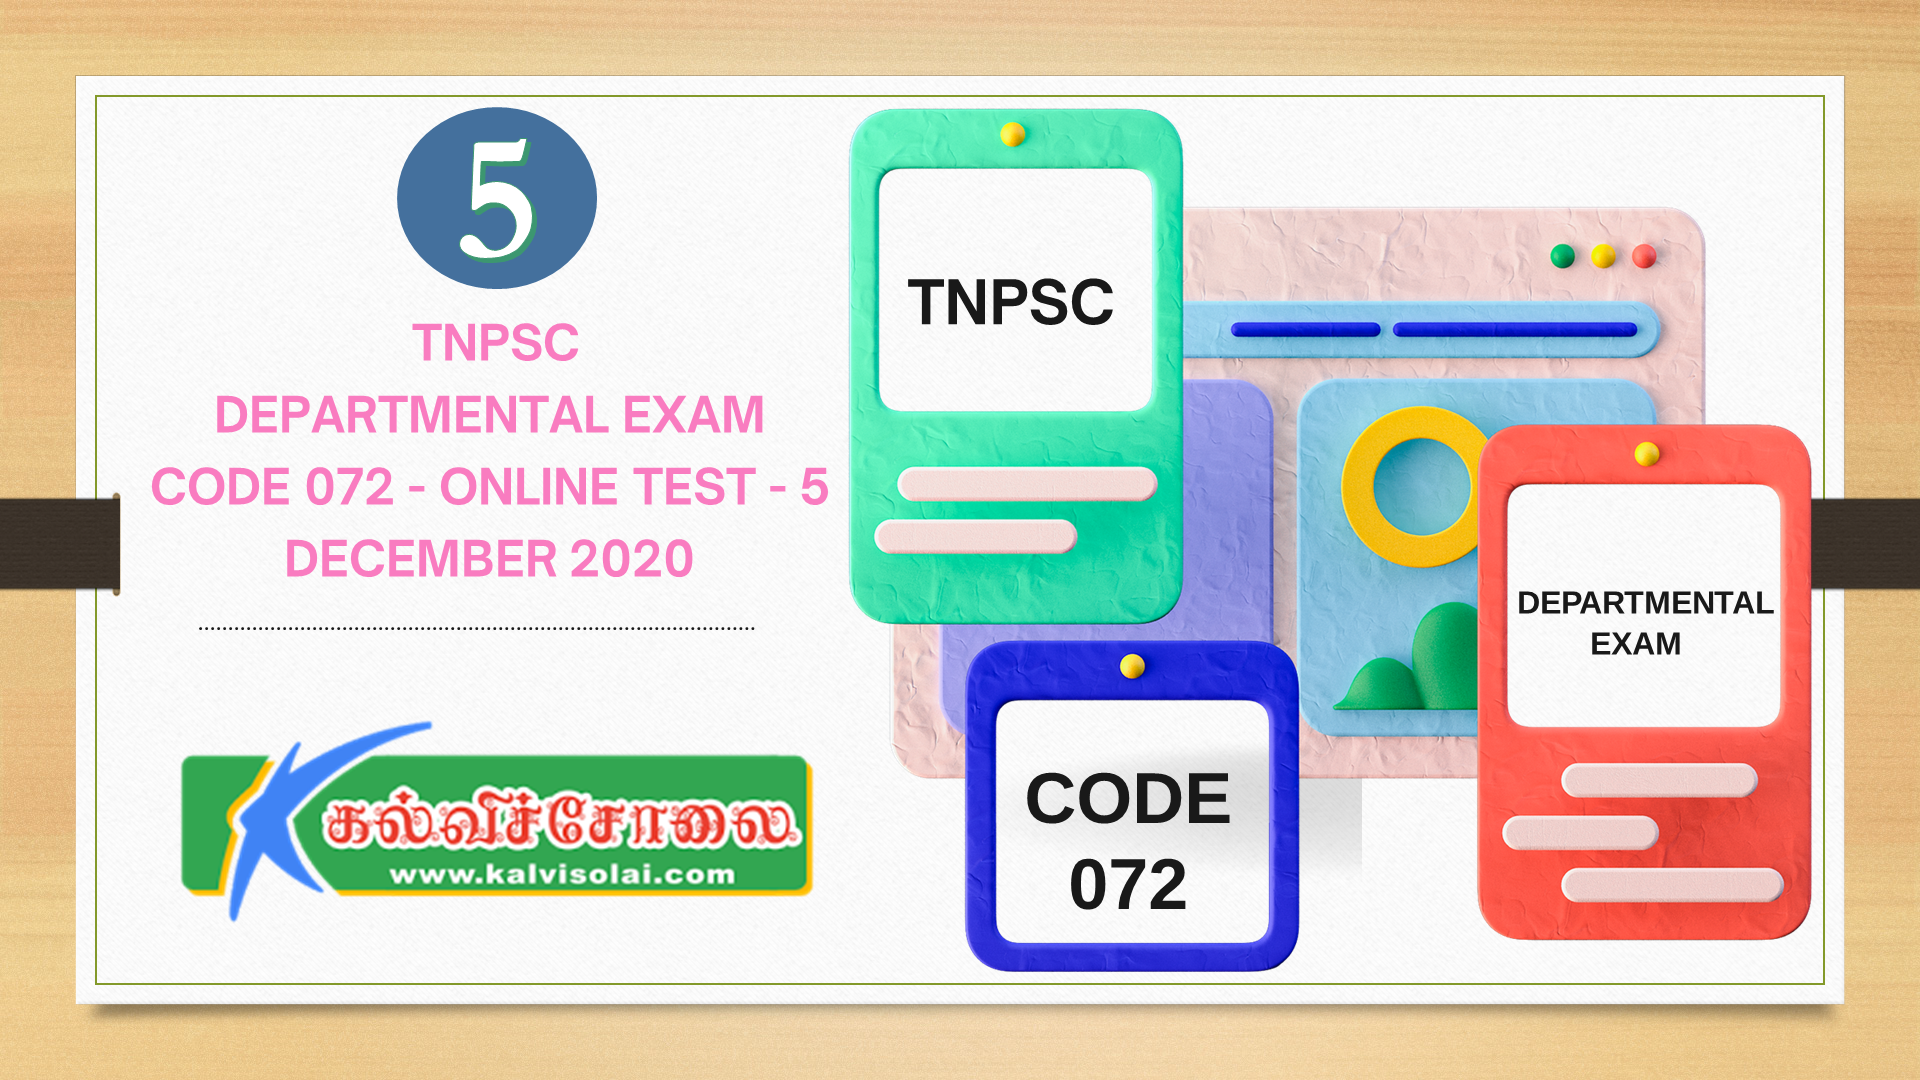 kalvisolai-kalviseihi-padasalai-kalvikural-kaninikkalvi-DOT-5-TNPSC DEPARTMENTAL EXAM - CODE 072 - ONLINE TEST - 05 - DECEMBER 2020 - 01-20 - KALVISOLAI.